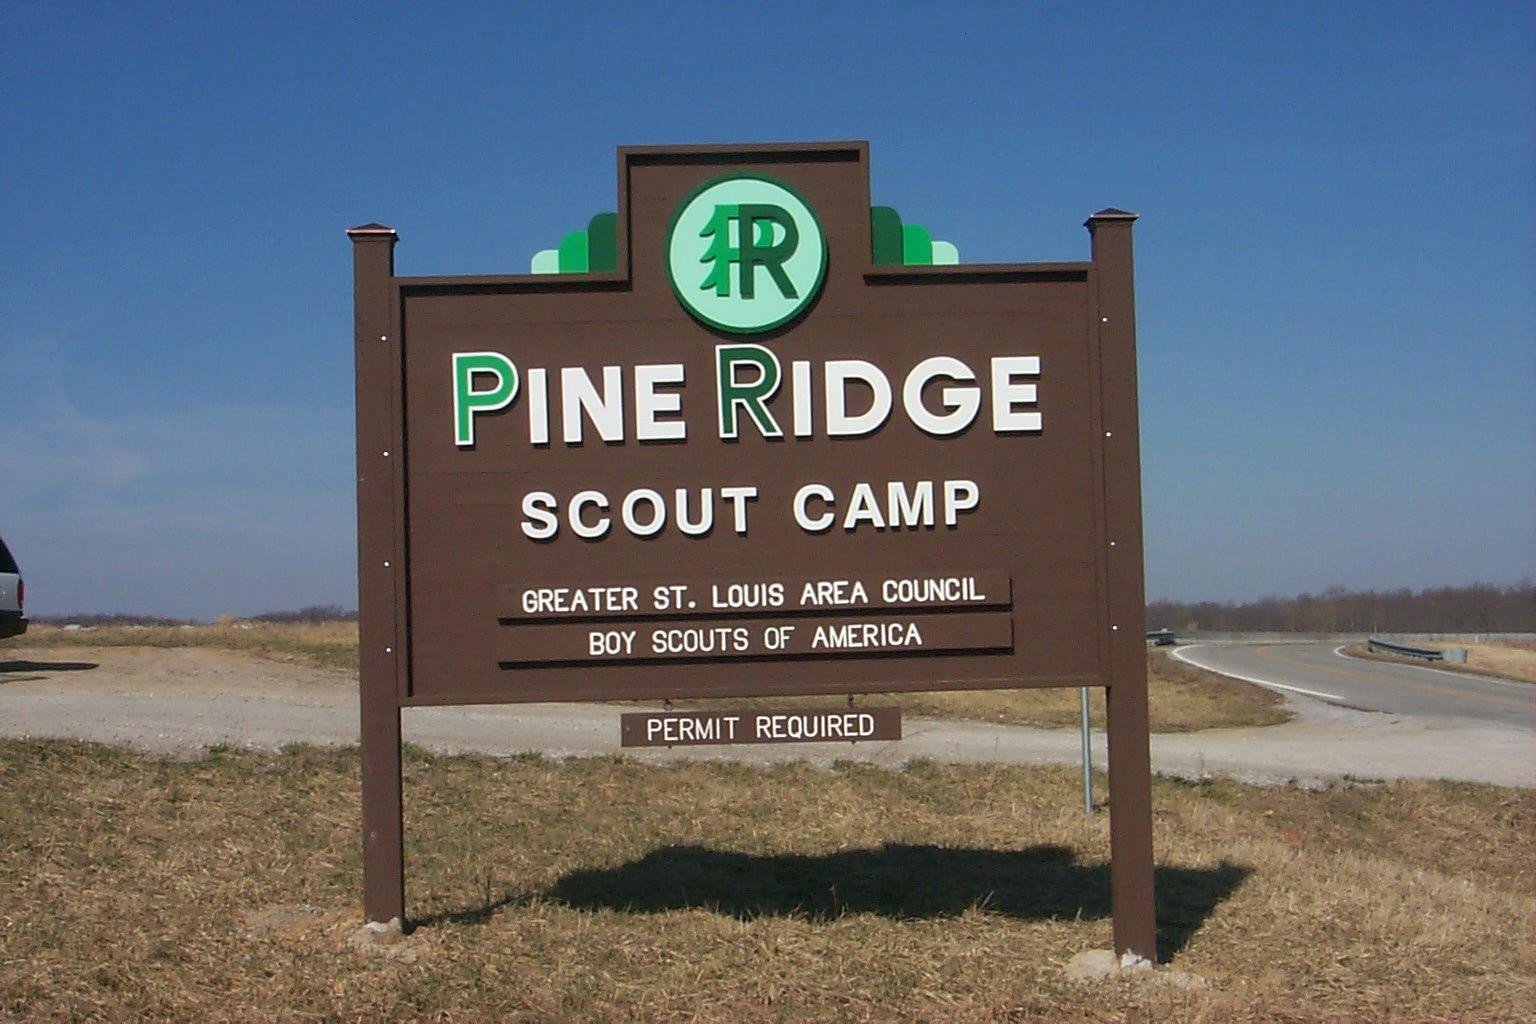 Pine Ridge Scout Camp, Greater St  Louis Area Council, Boy